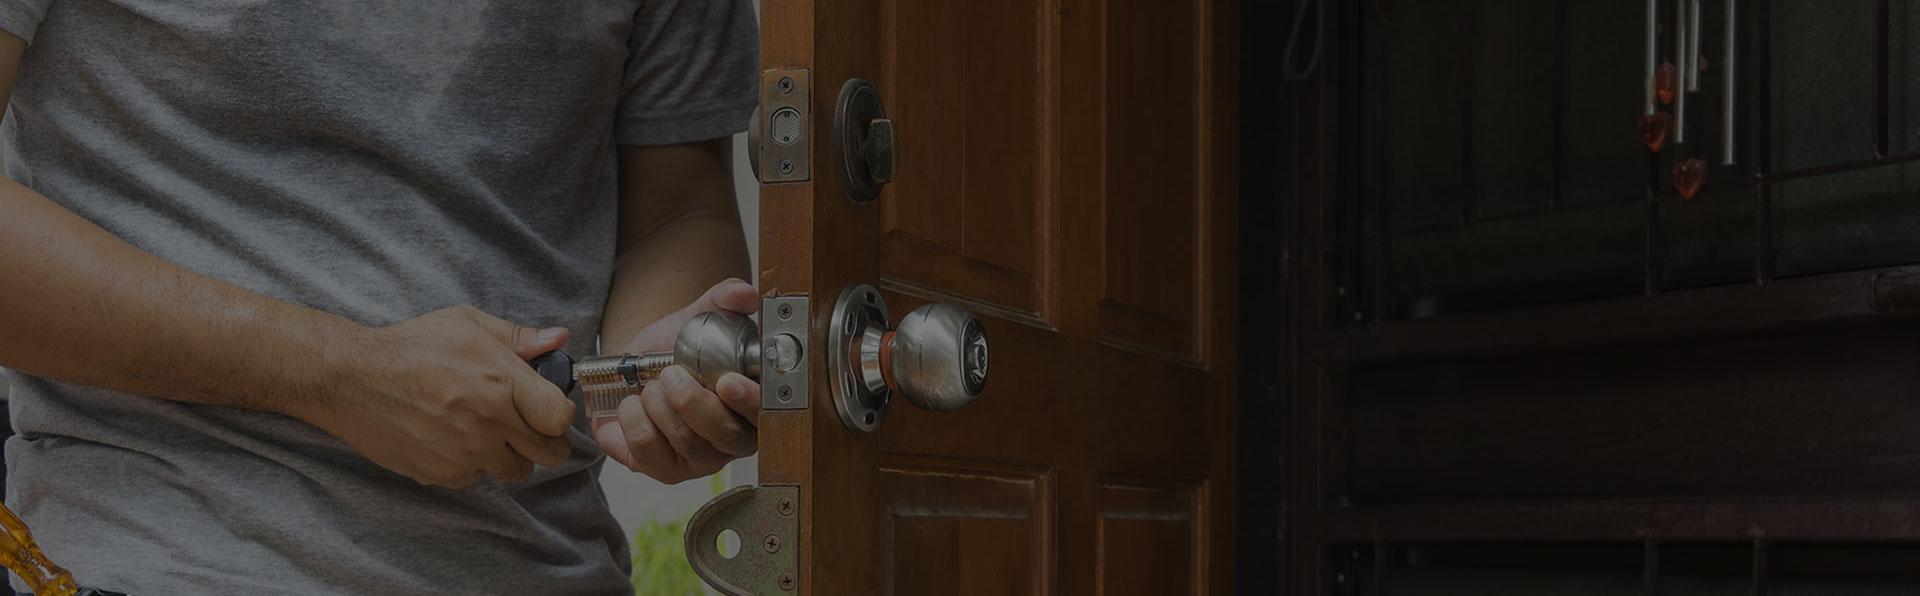 residential-locksmith-narre-warren